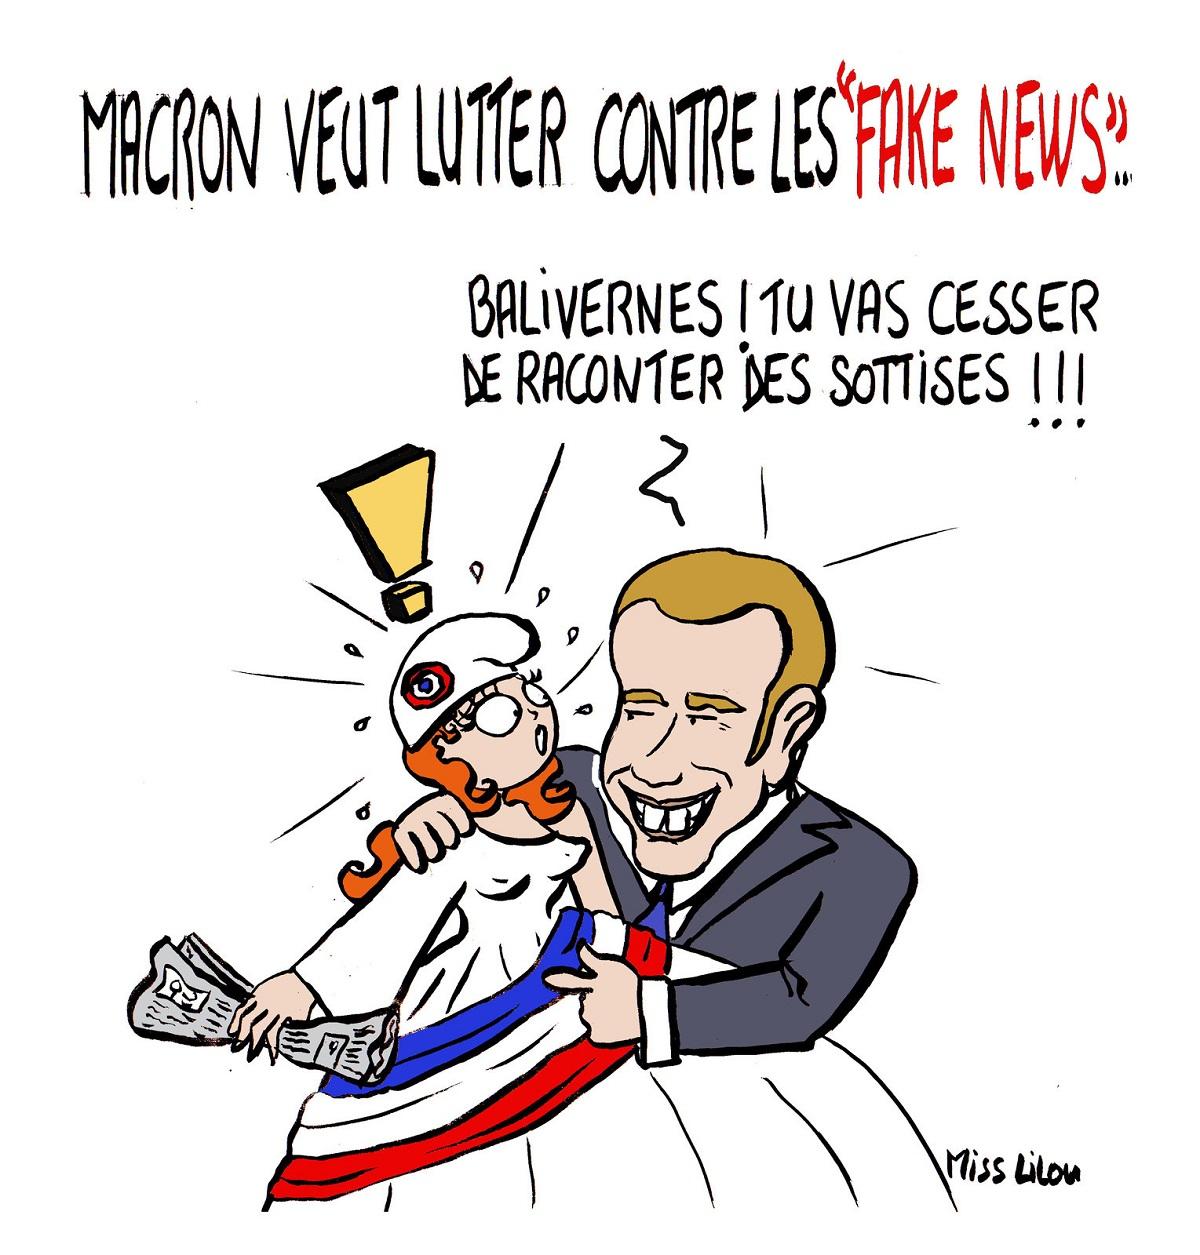 dessin humoristique d'Emmanuel Macron tentant d'interdire à Marianne de diffuser des fake news